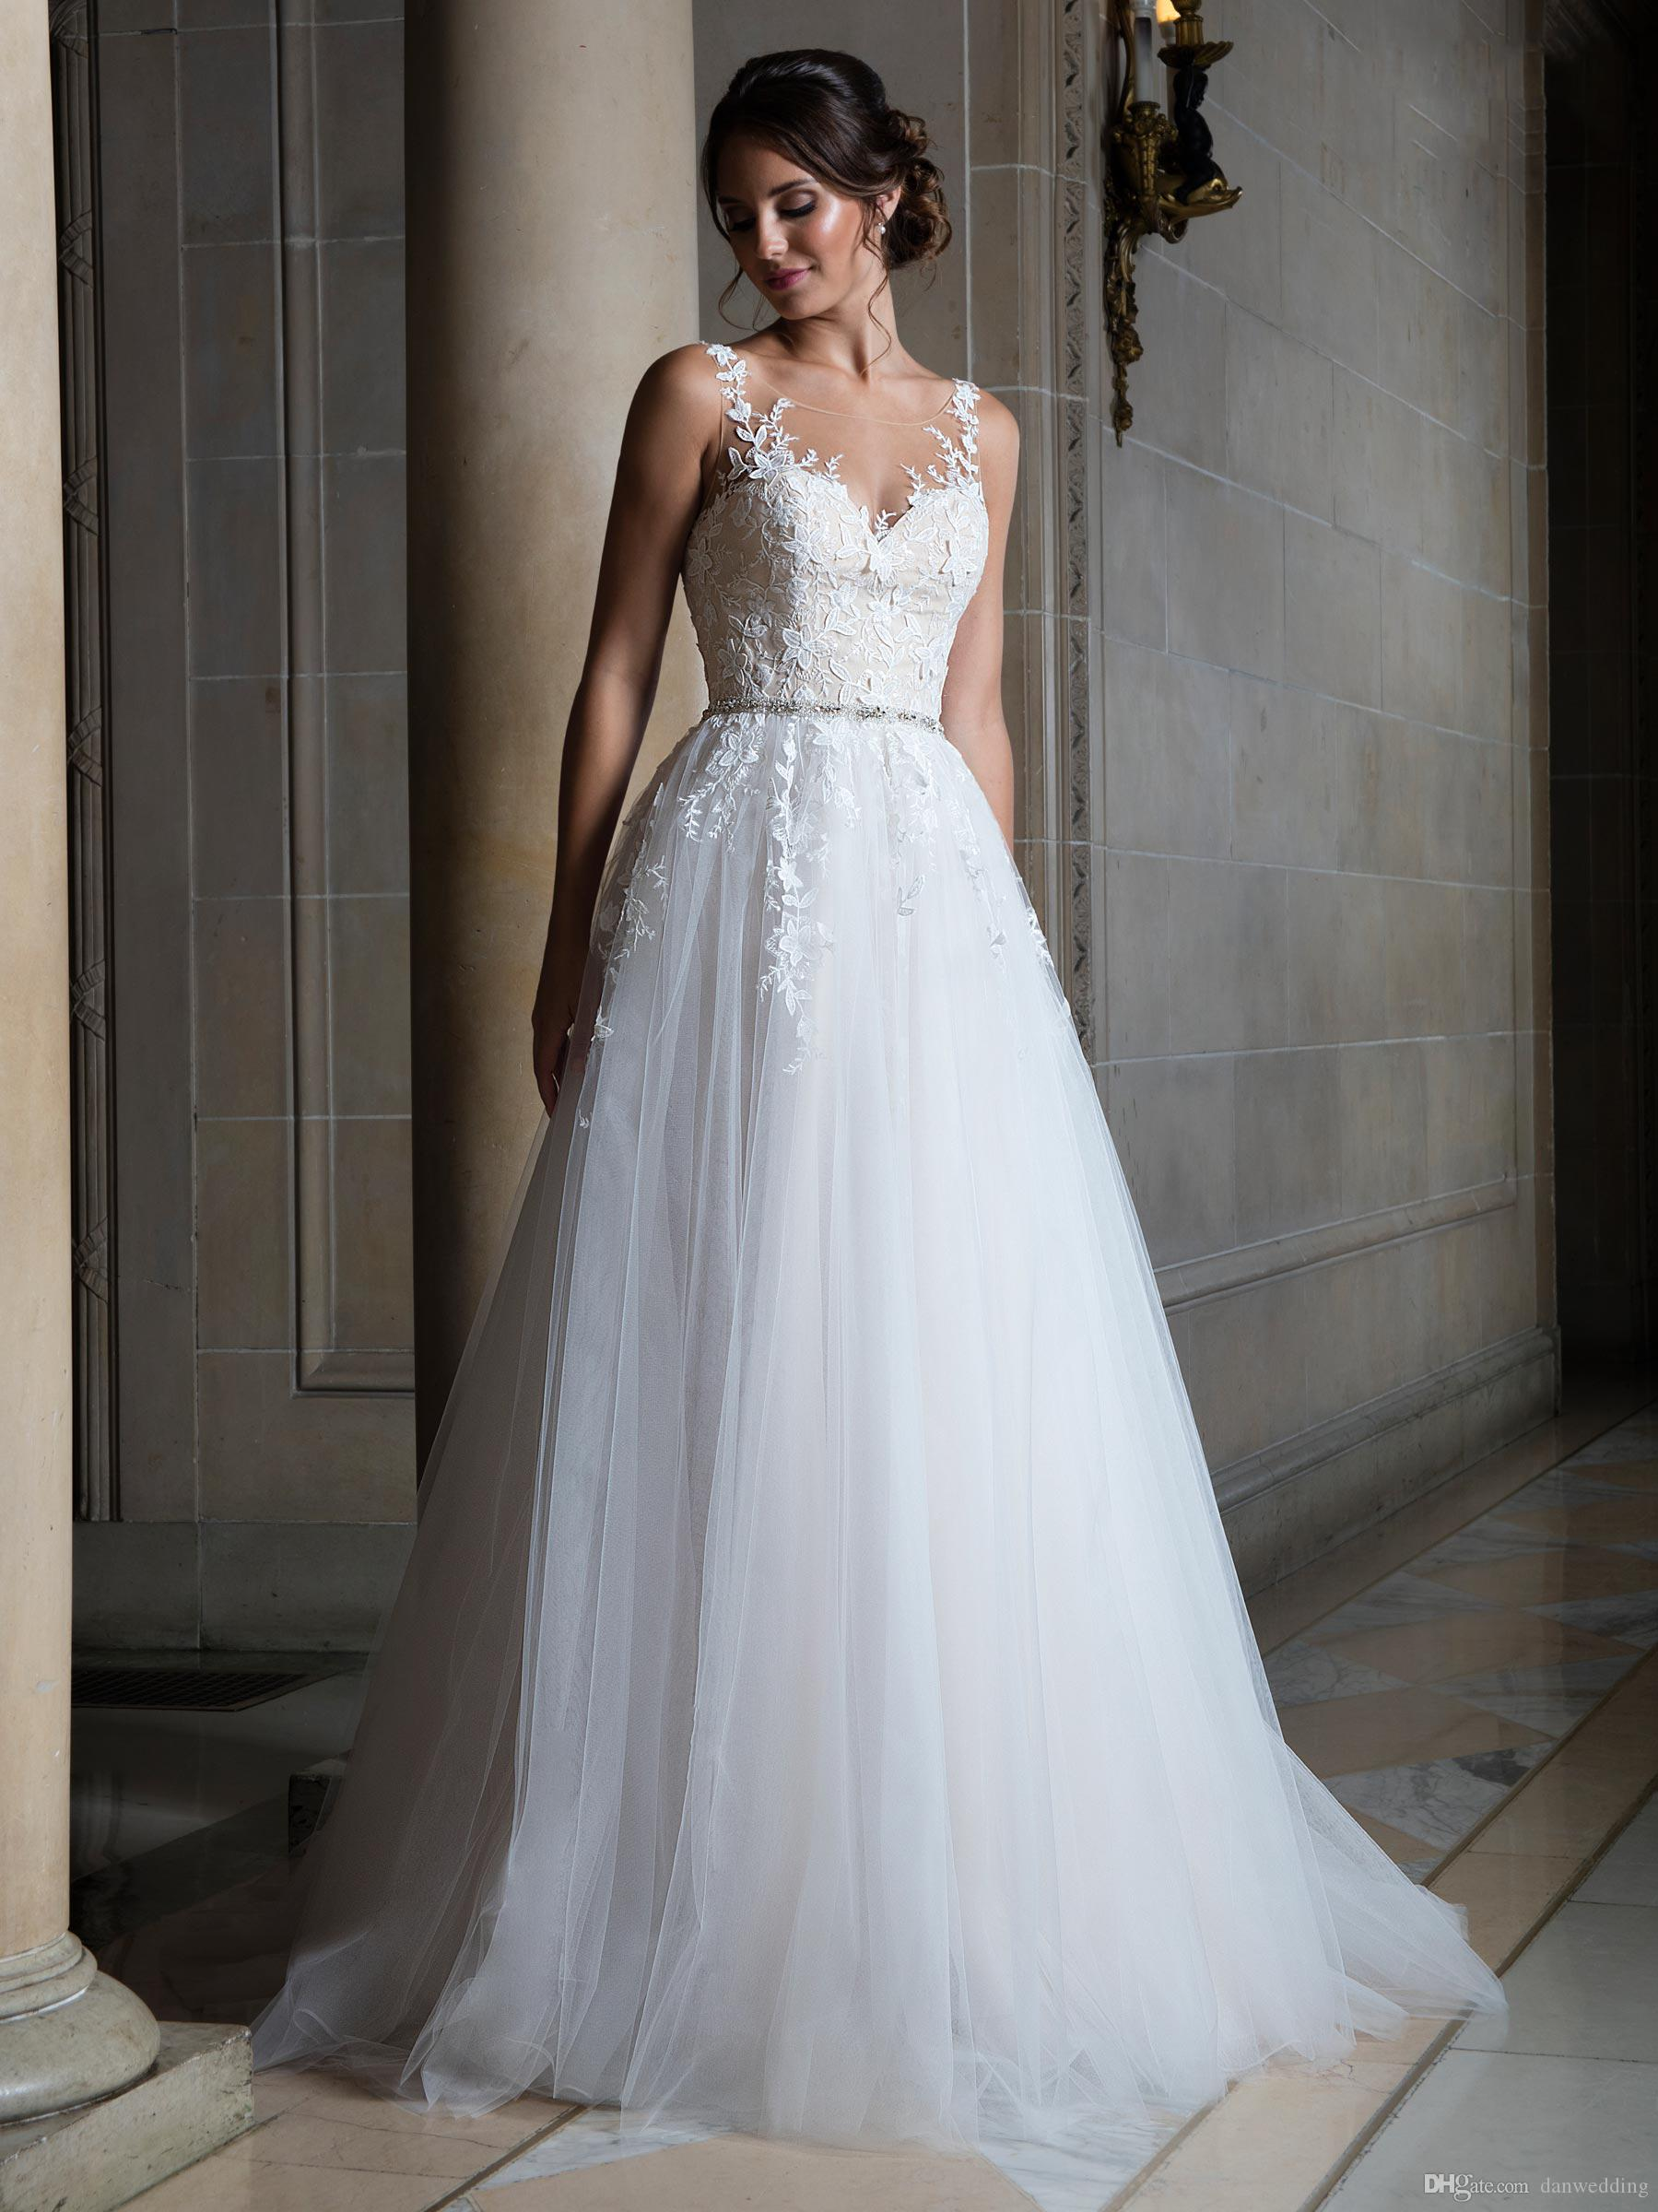 Beauty White Tulle Scoop Applique Beads A-Line Wedding Dresses Bridal Pageant Dresses Wedding Attire Dresses Custom Size 2-16 KF1014140